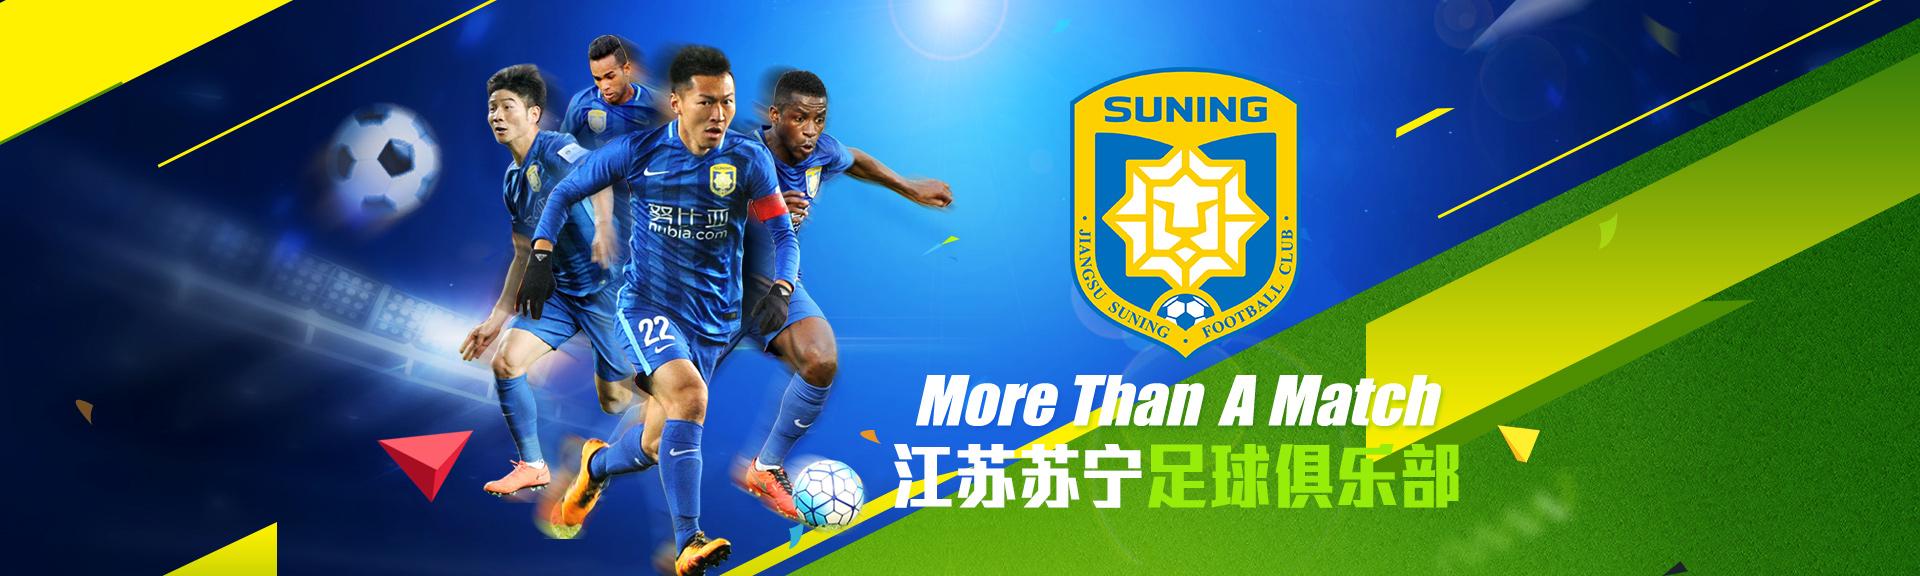 http://image.suning.cn/uimg/sop/commodity/809507516205232809994720_x.jpg